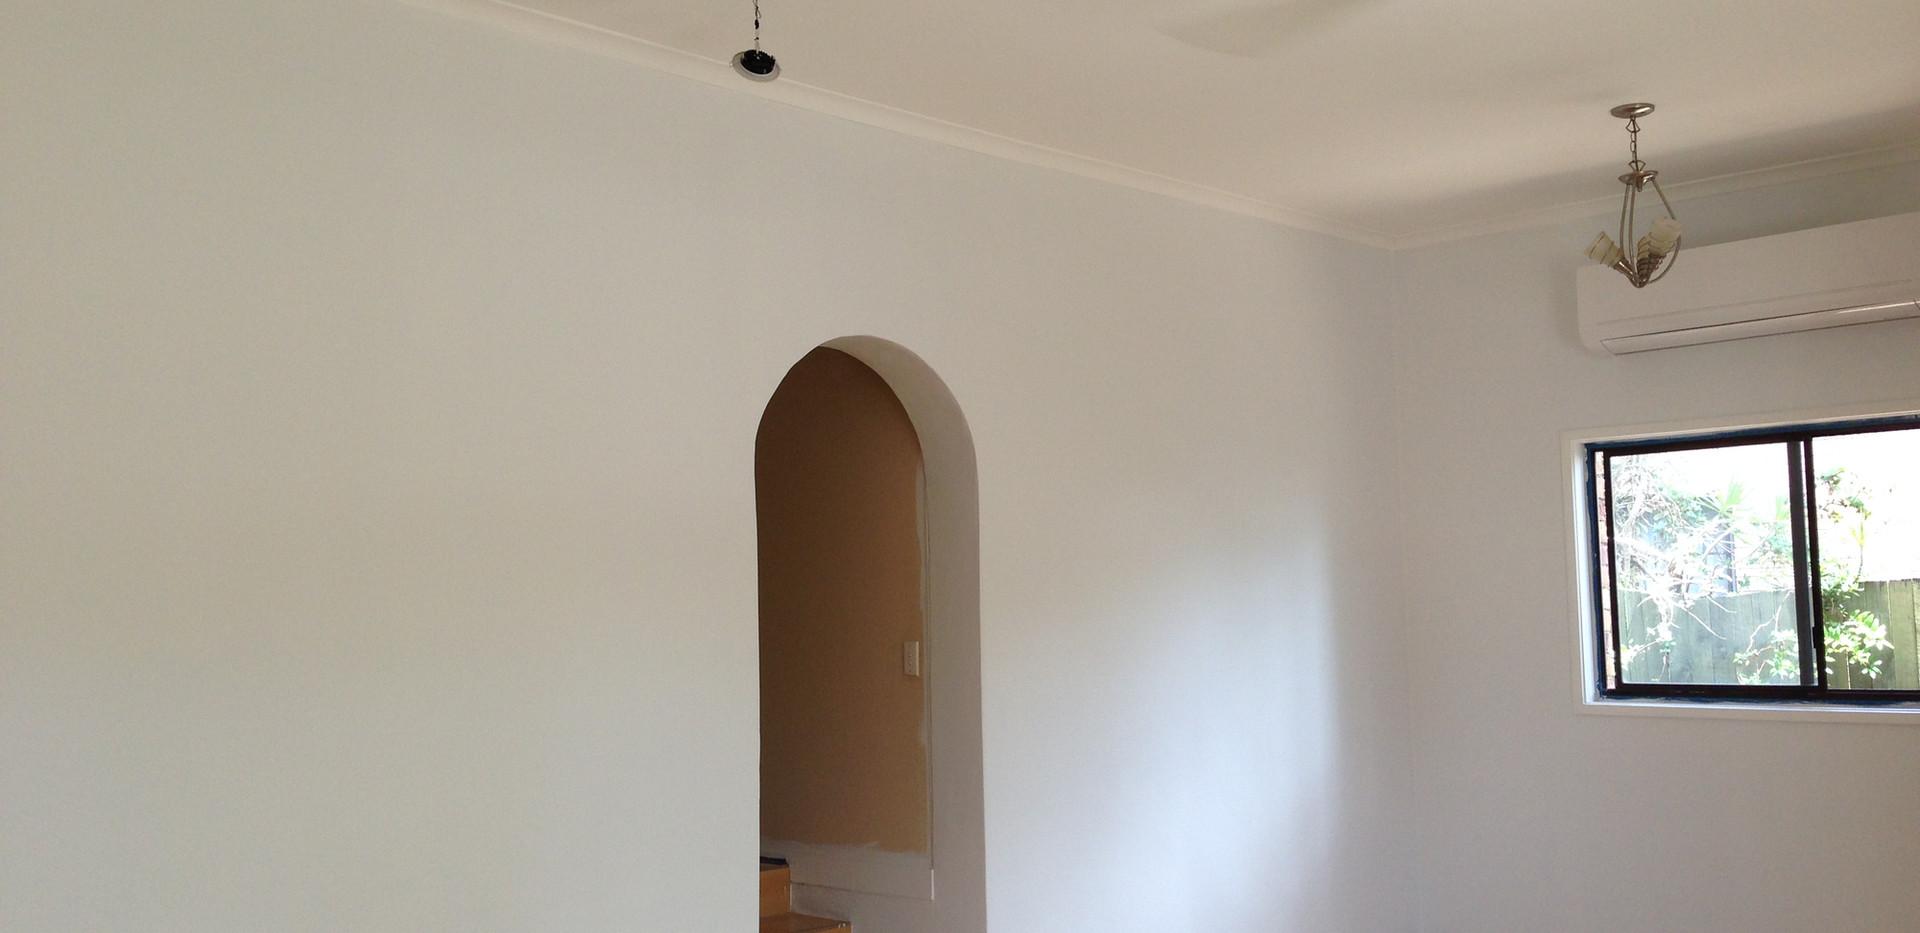 Wall Repair and Painting